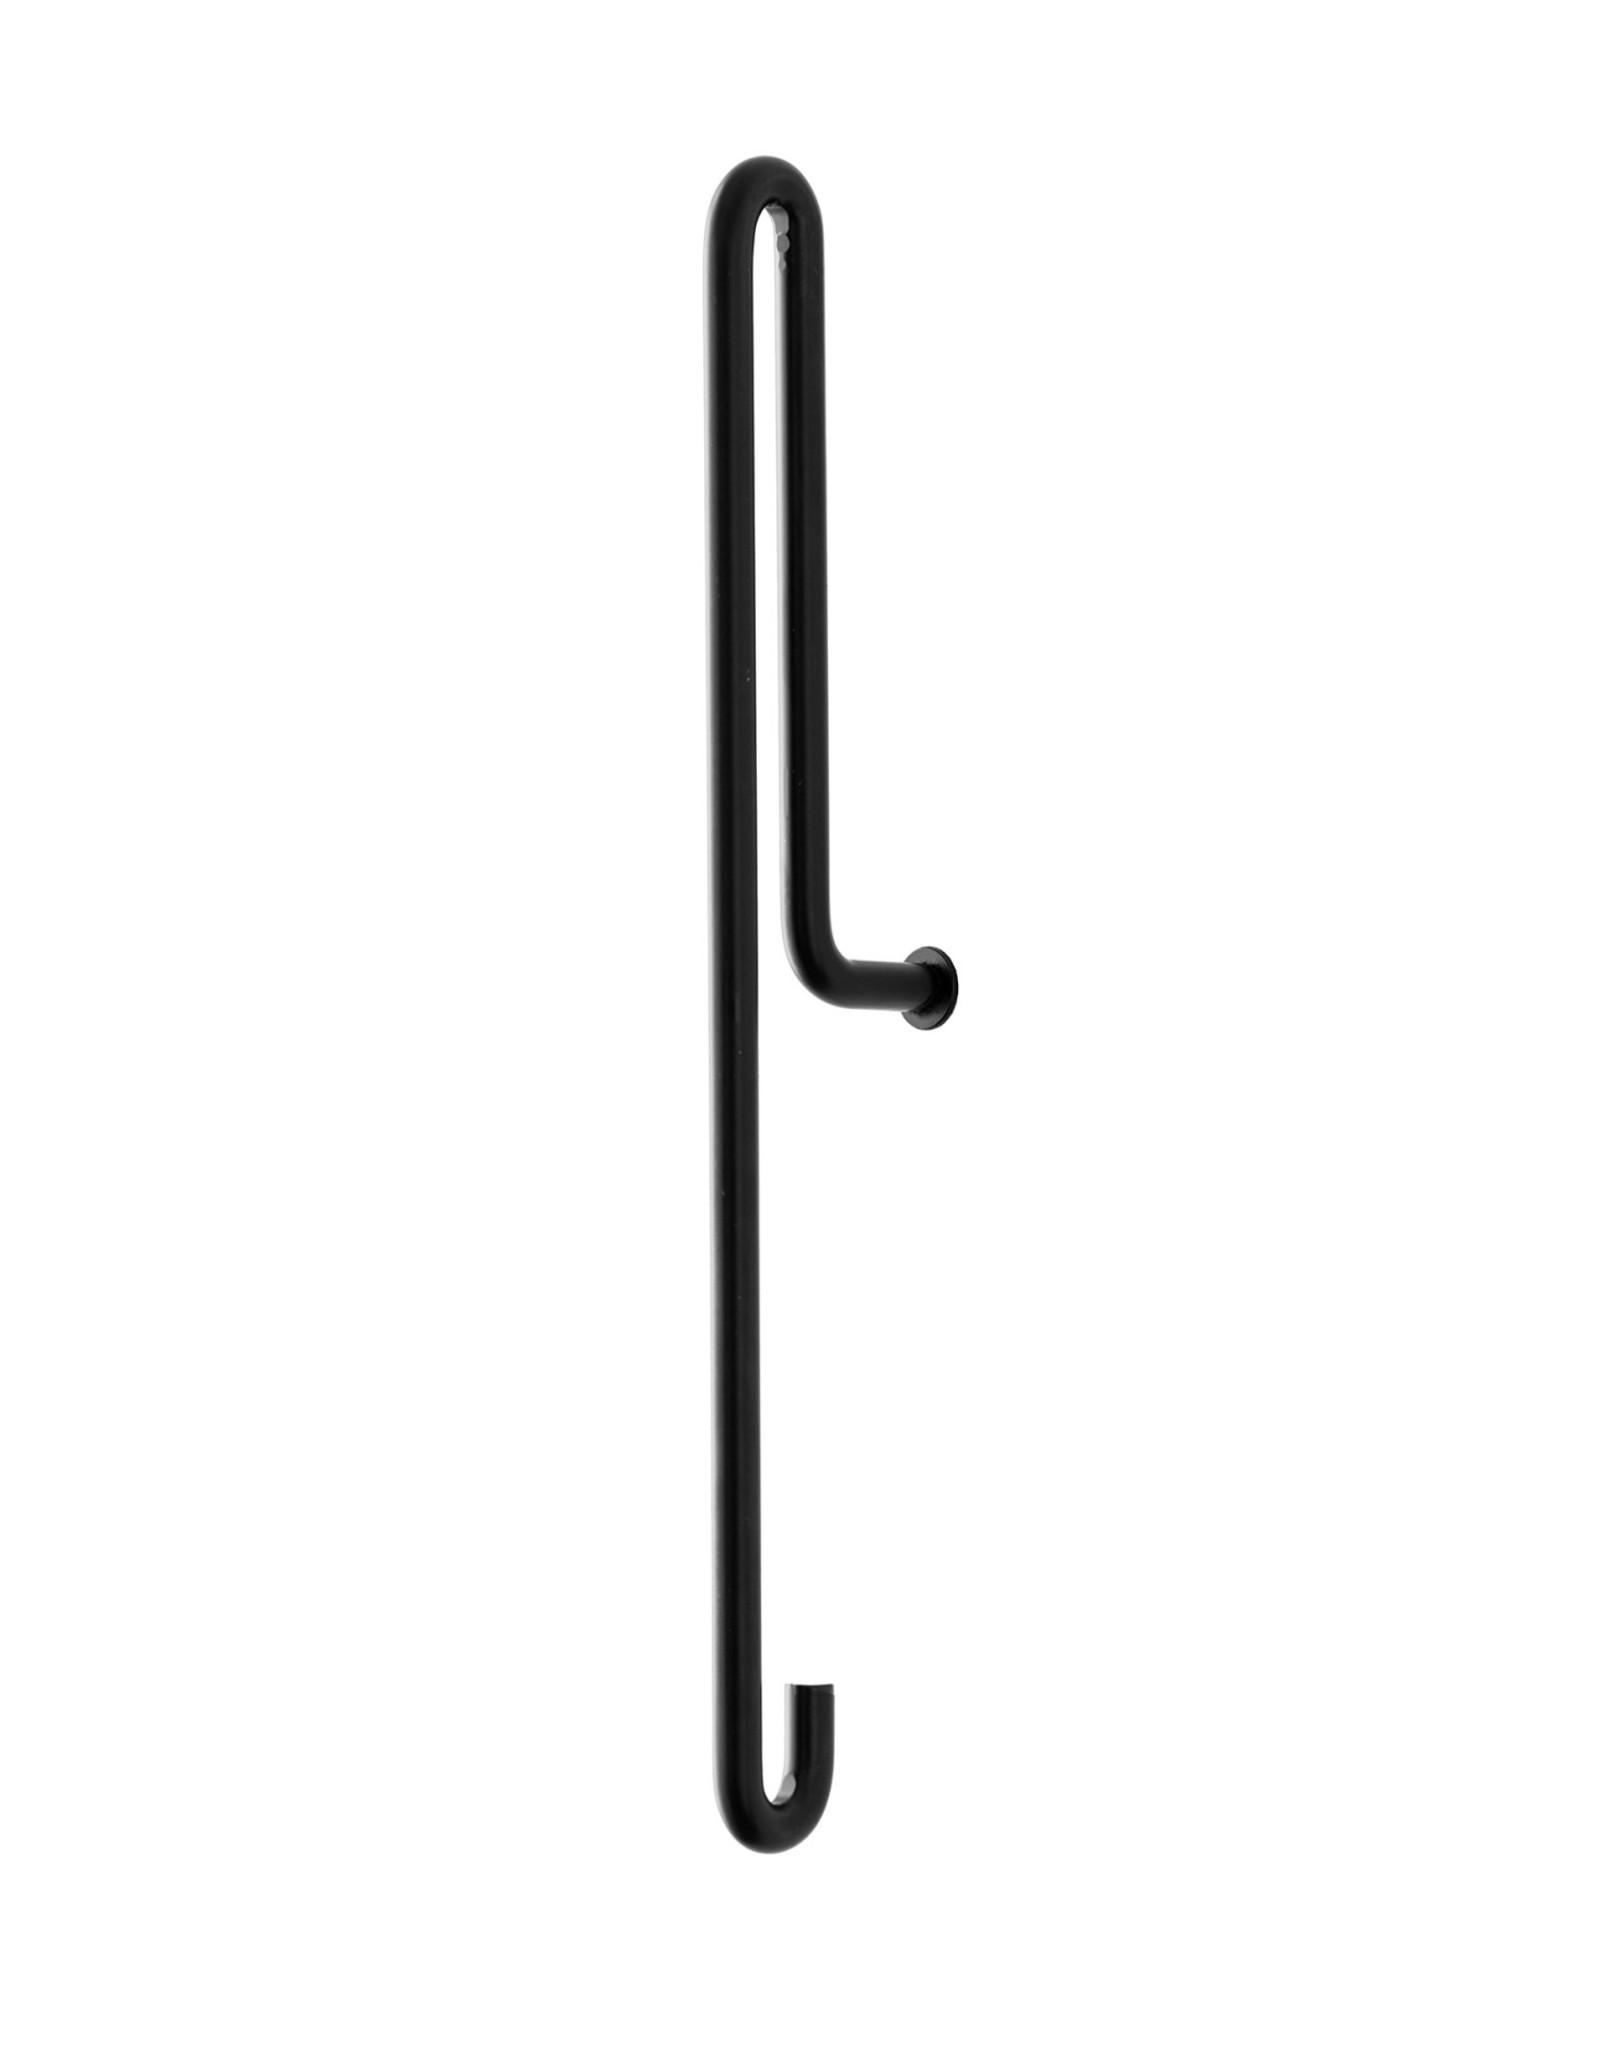 Moebe Moebe Wall Hook Large Black